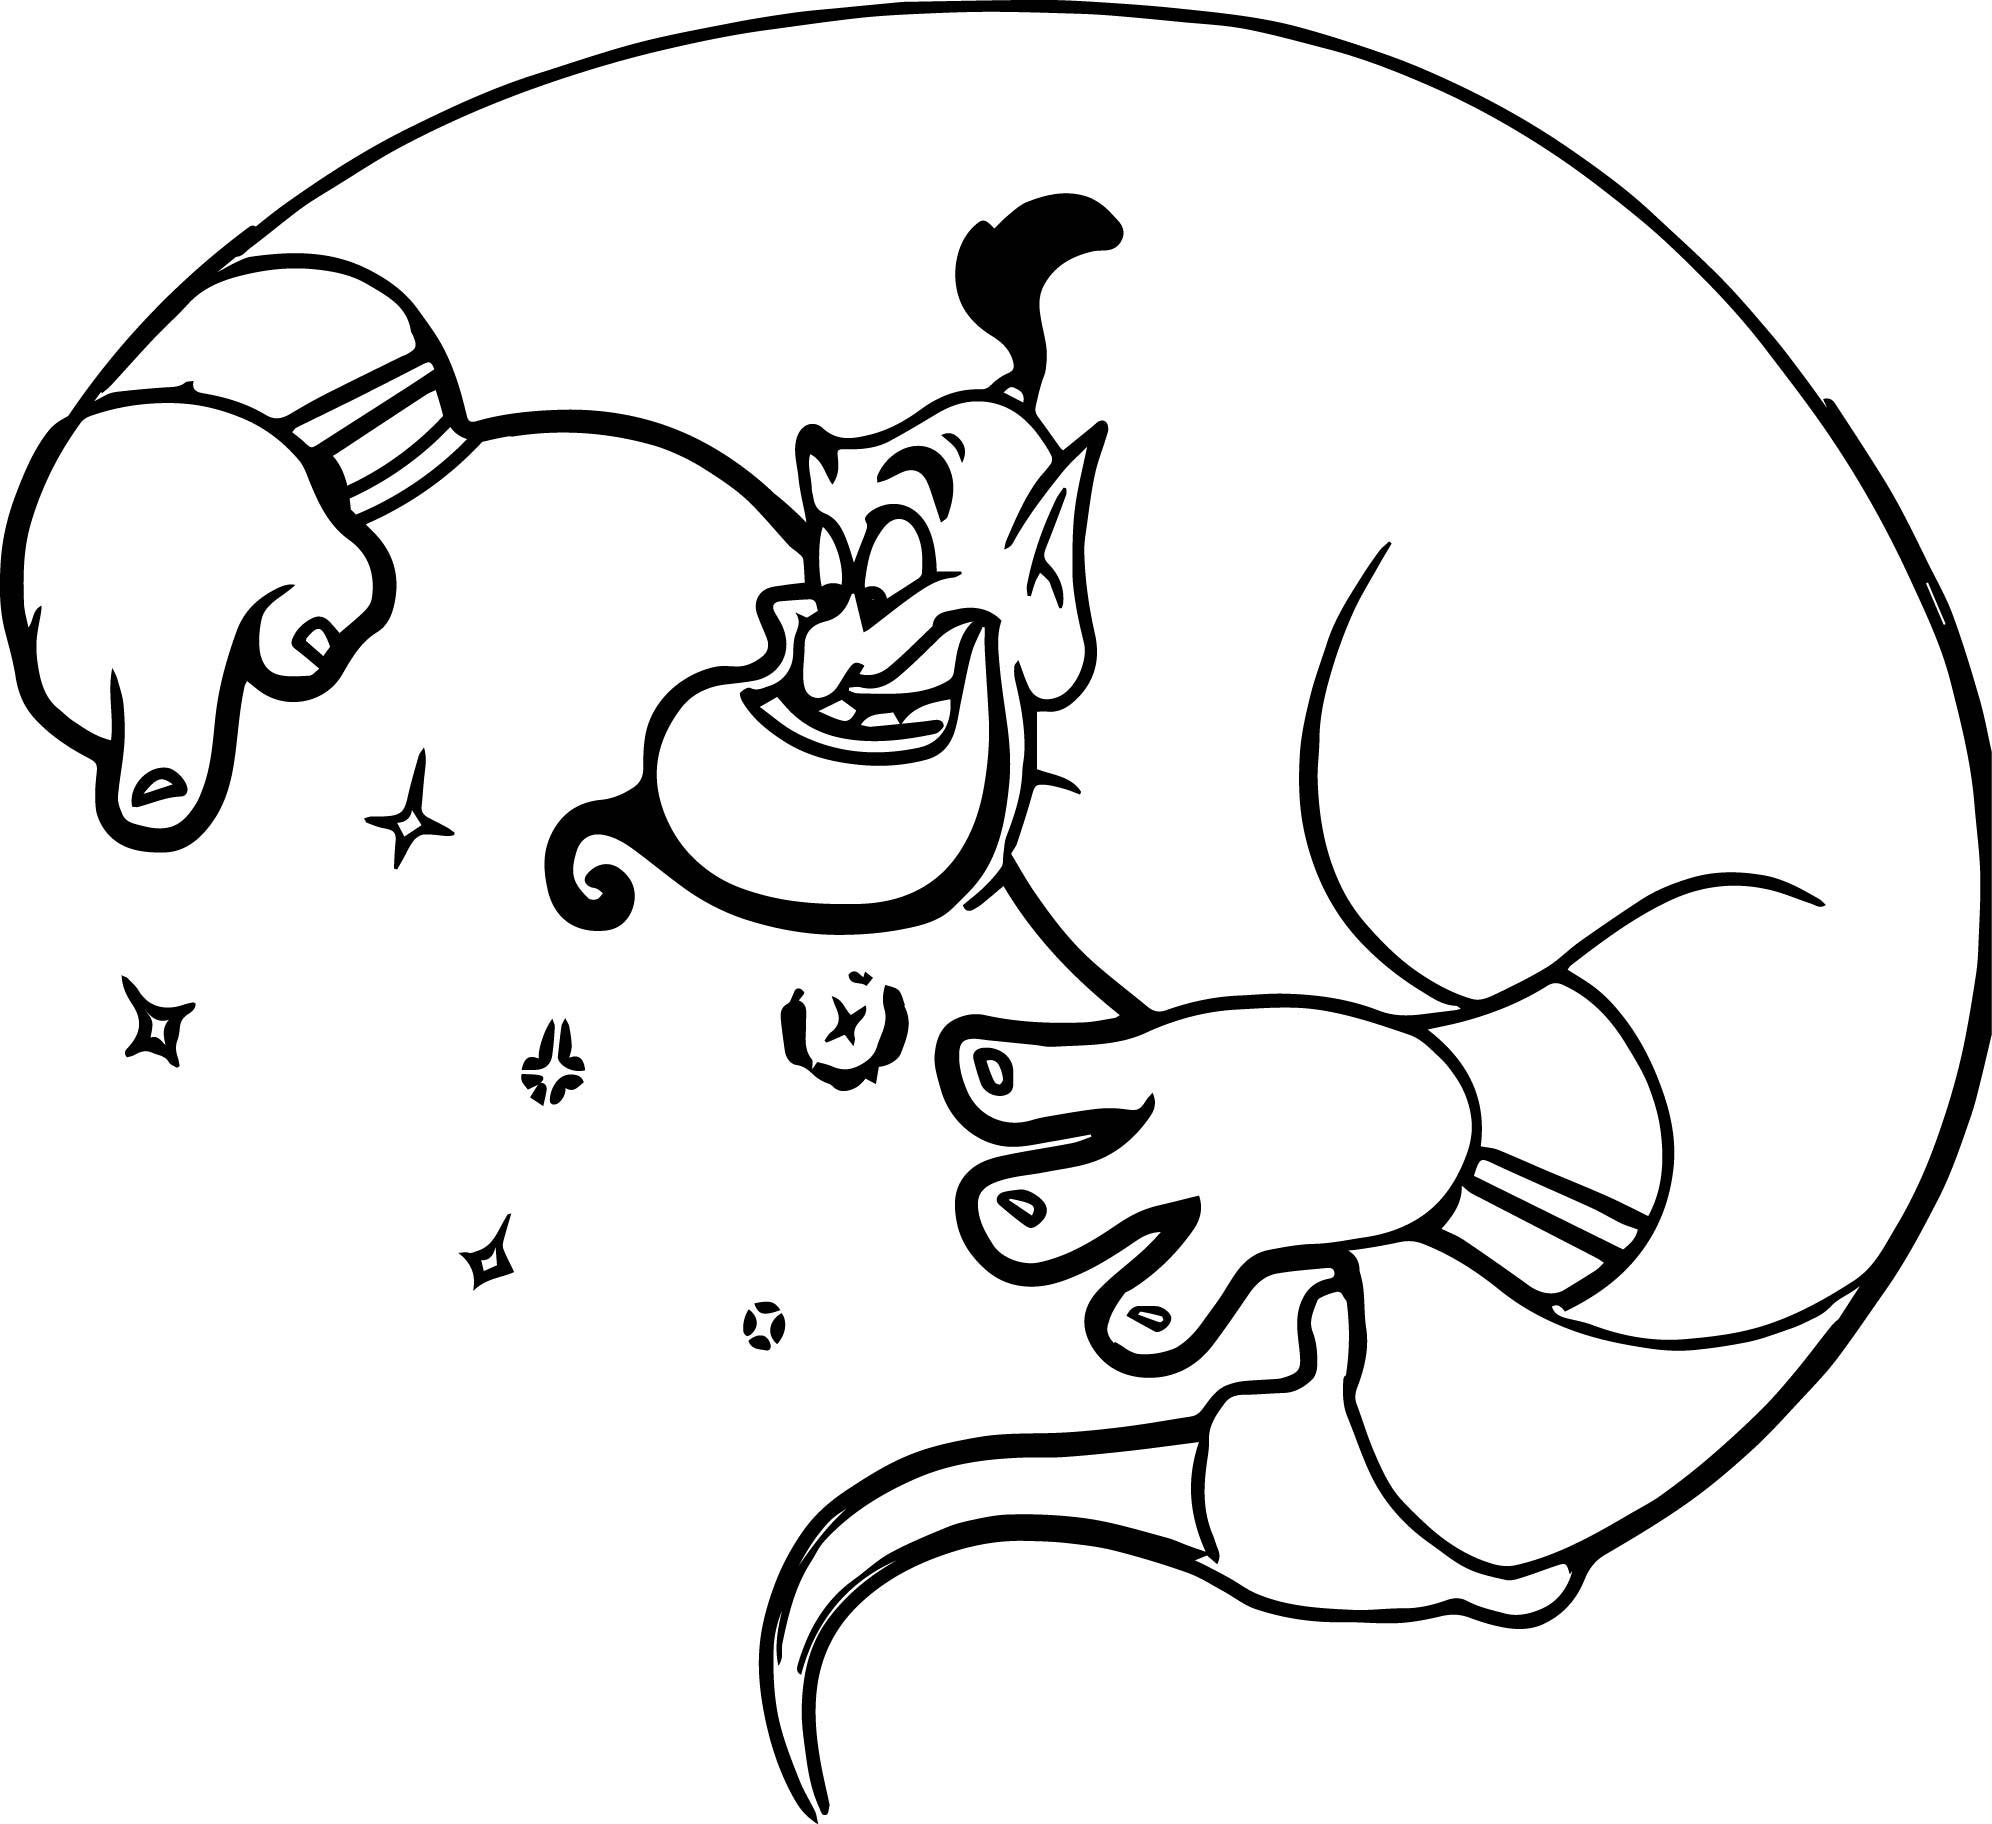 1992x1824 Disney Aladdin Coloring Pages Diy Craft Ideas Cartoon General